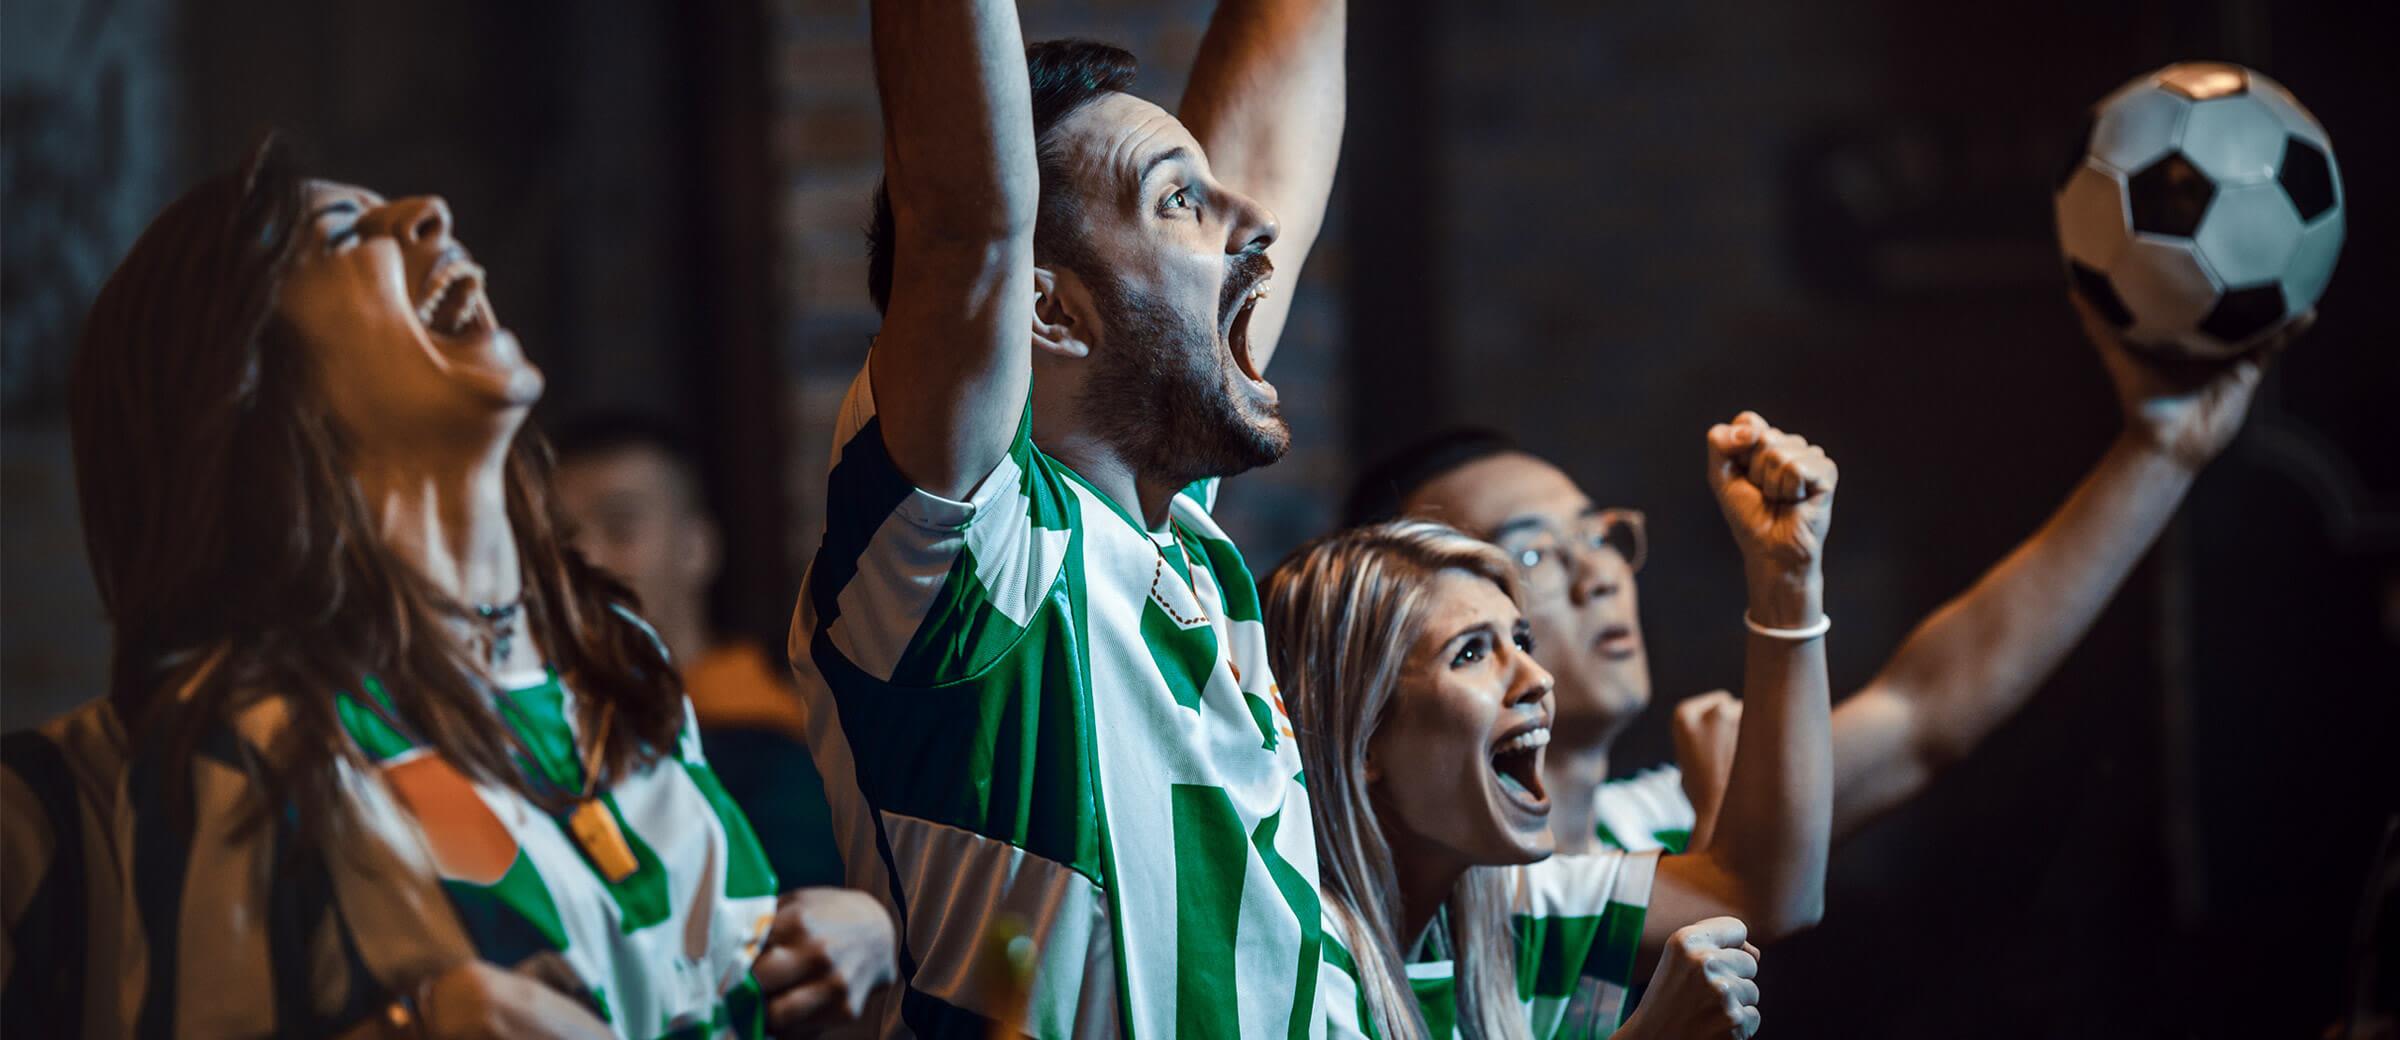 Football on TELUS PureFibre network